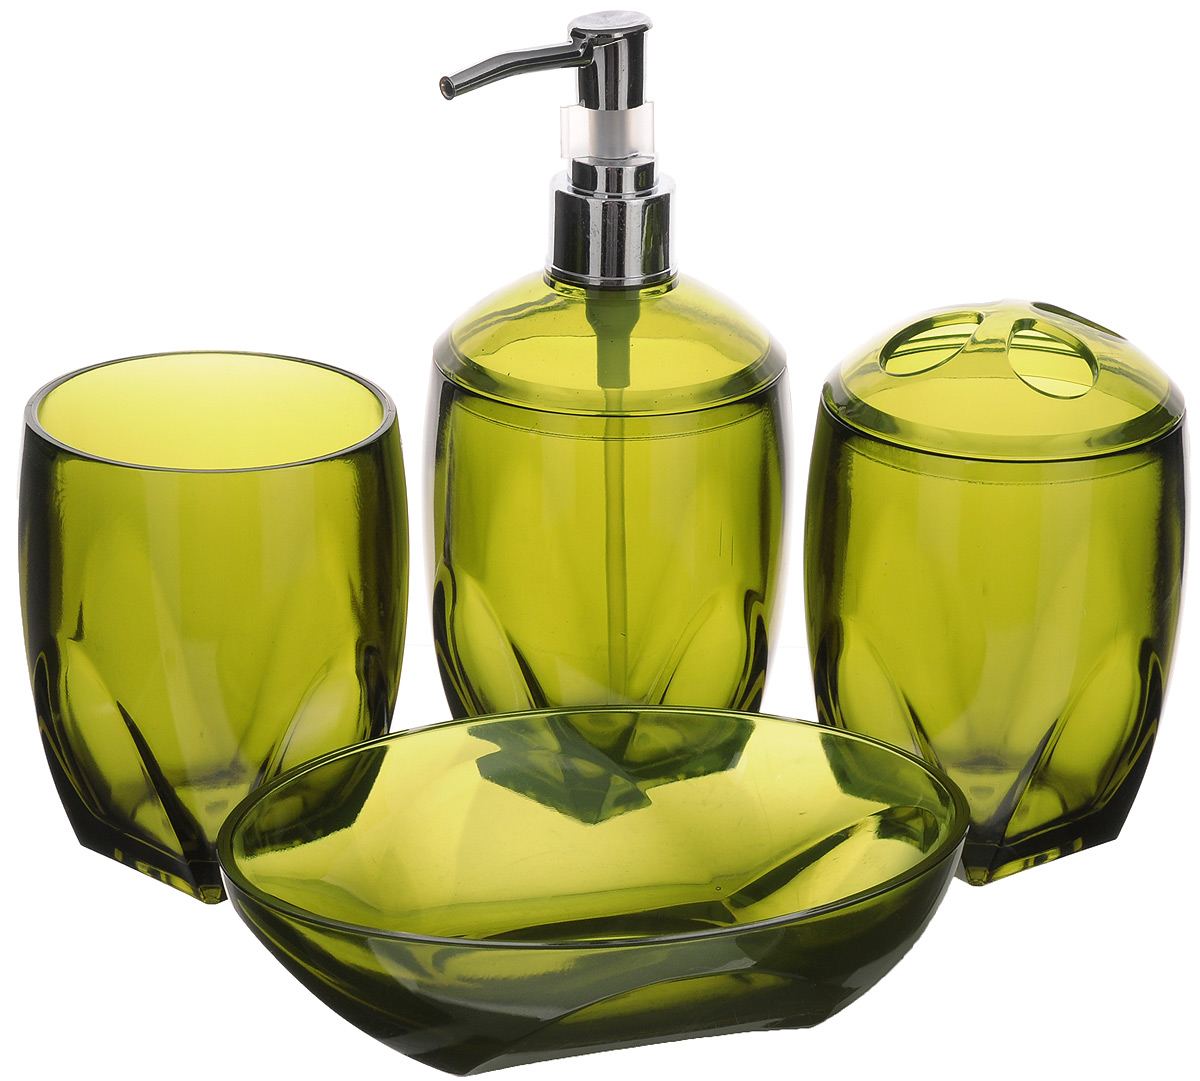 Набор для ванной комнаты Aqva Line Олива, 4 предмета набор сомелье цвет бежевый 15 х 17 х 4 см 4 предмета 57655